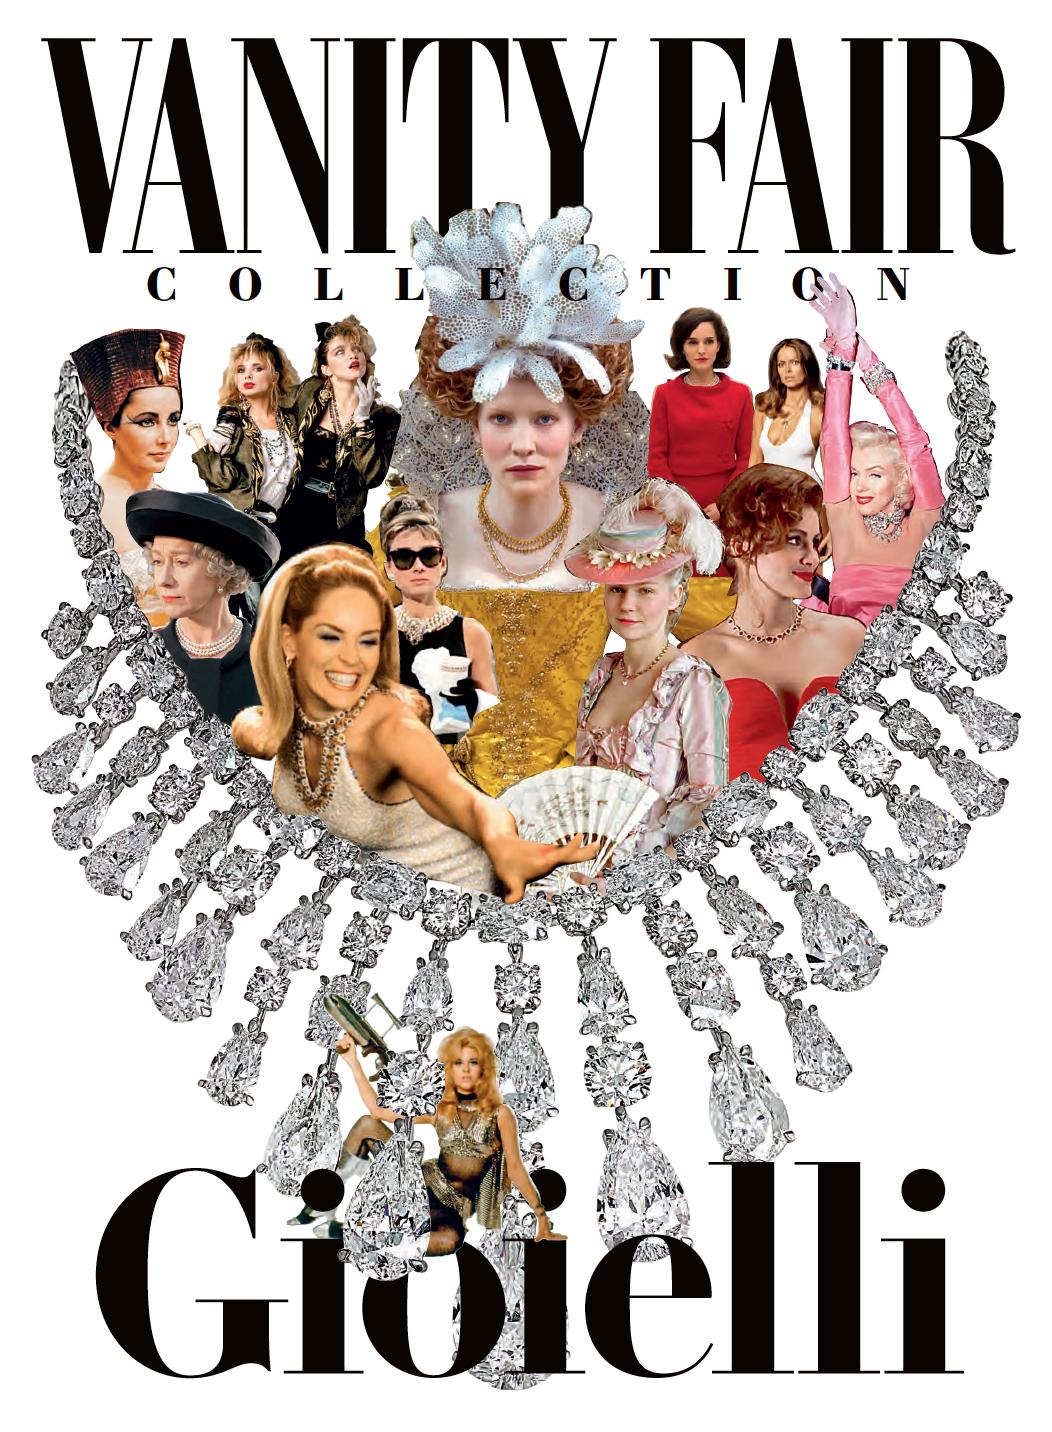 Vanity Fair / Billy Kidd